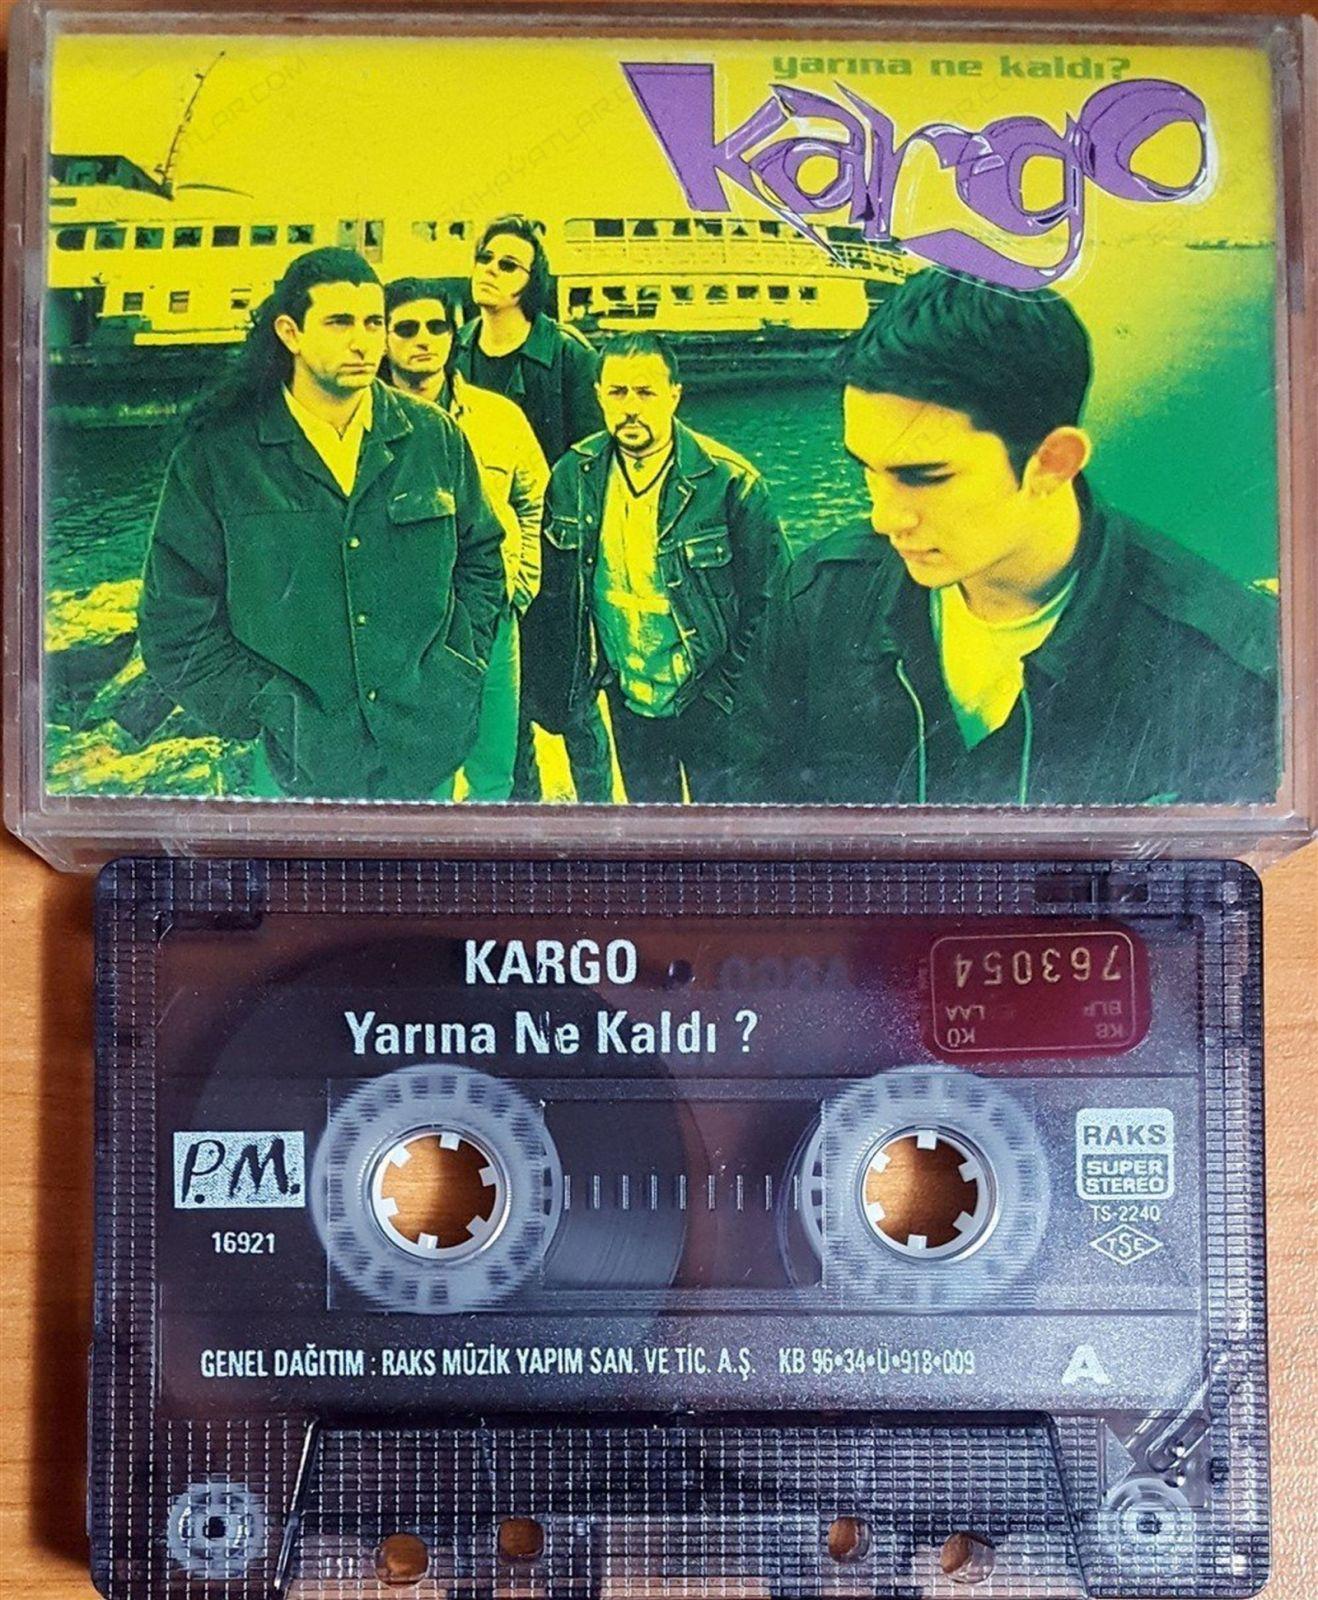 0262-kargo-grubu-2004-aktuel-roportaji-sevmek-zor-sairin-elinde (3)